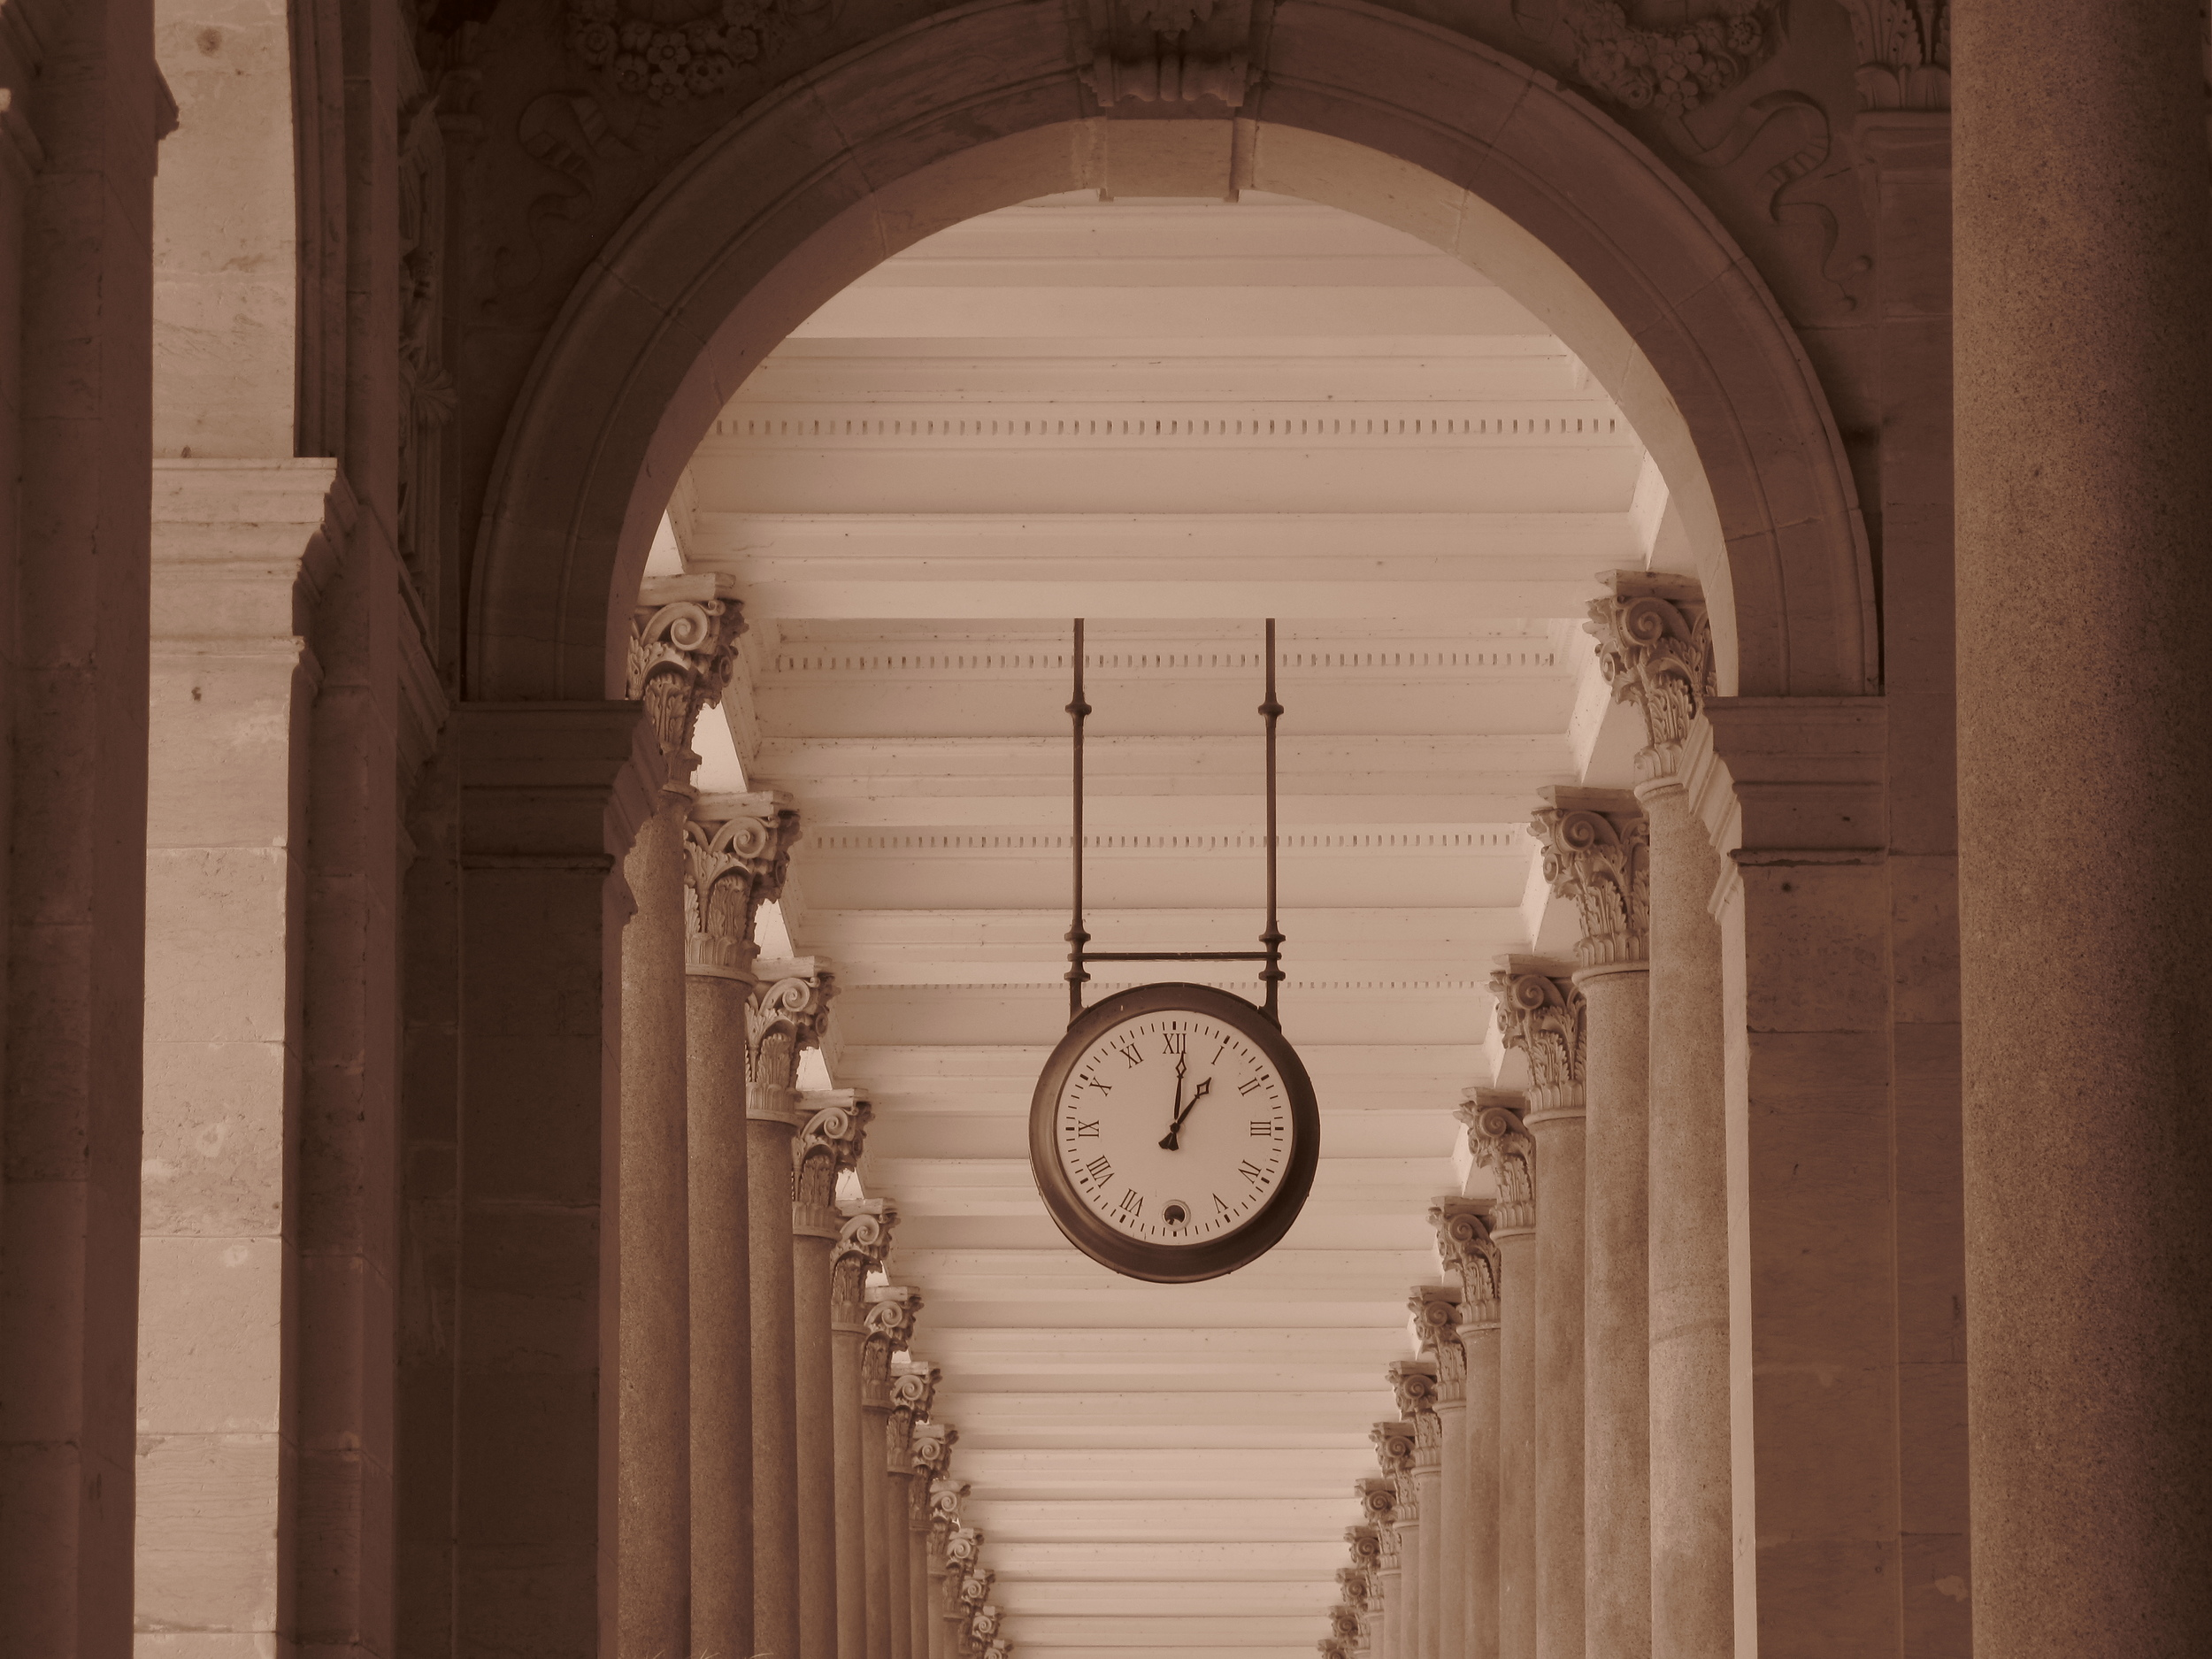 Old clock in a promenade, Karlovy Vary.